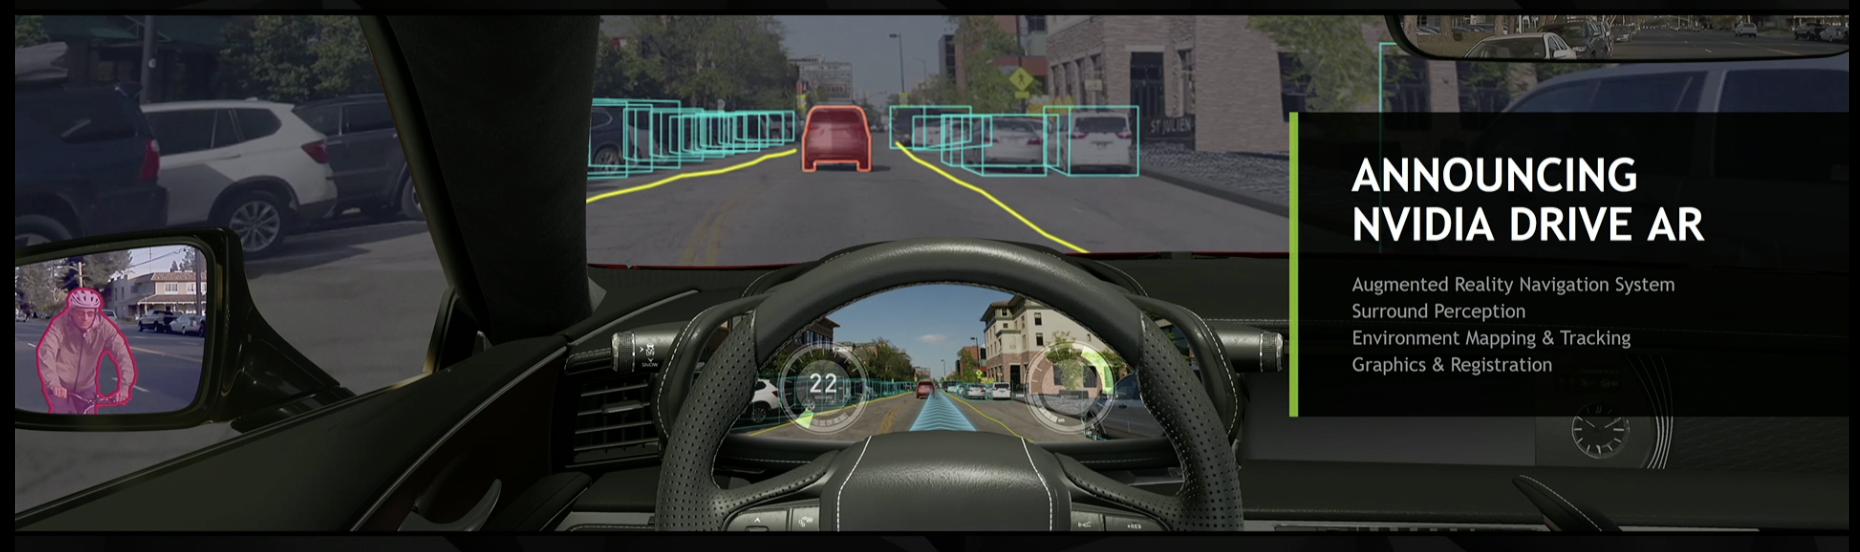 augmented reality nvidia